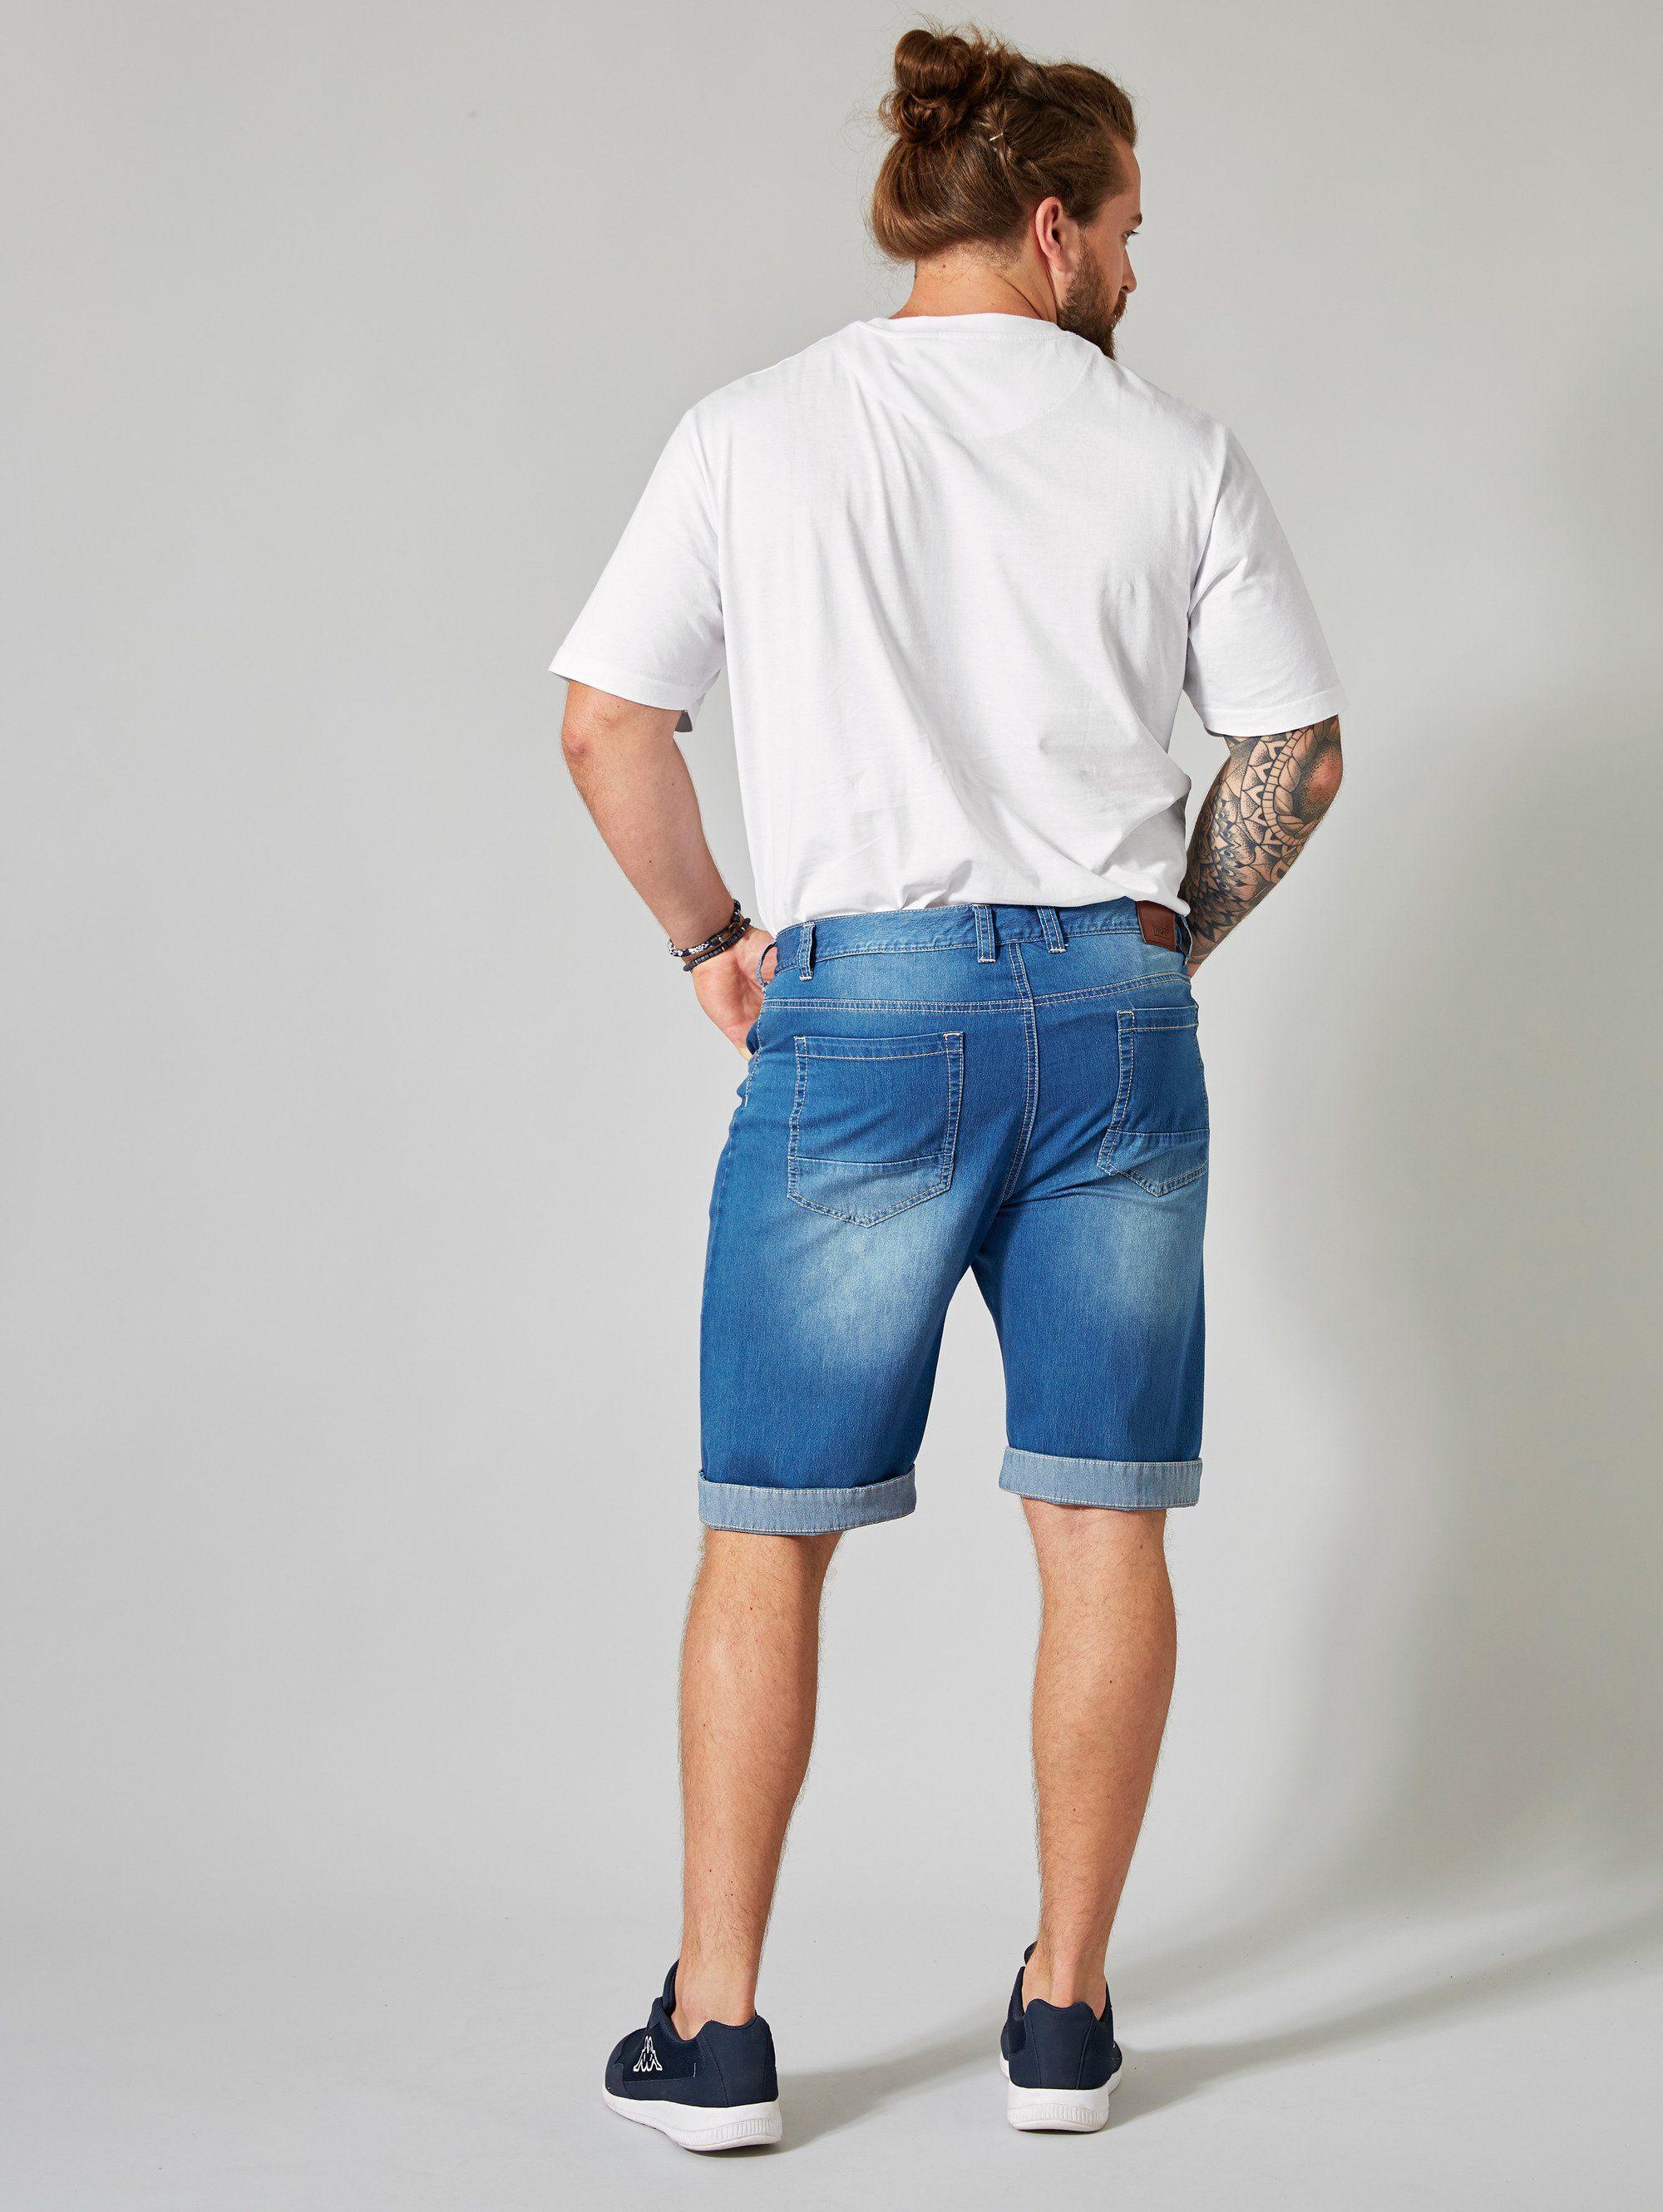 Men Plus by Happy Size Jeansbermuda | Bekleidung > Shorts & Bermudas > Jeans Bermudas | Men Plus By Happy Size